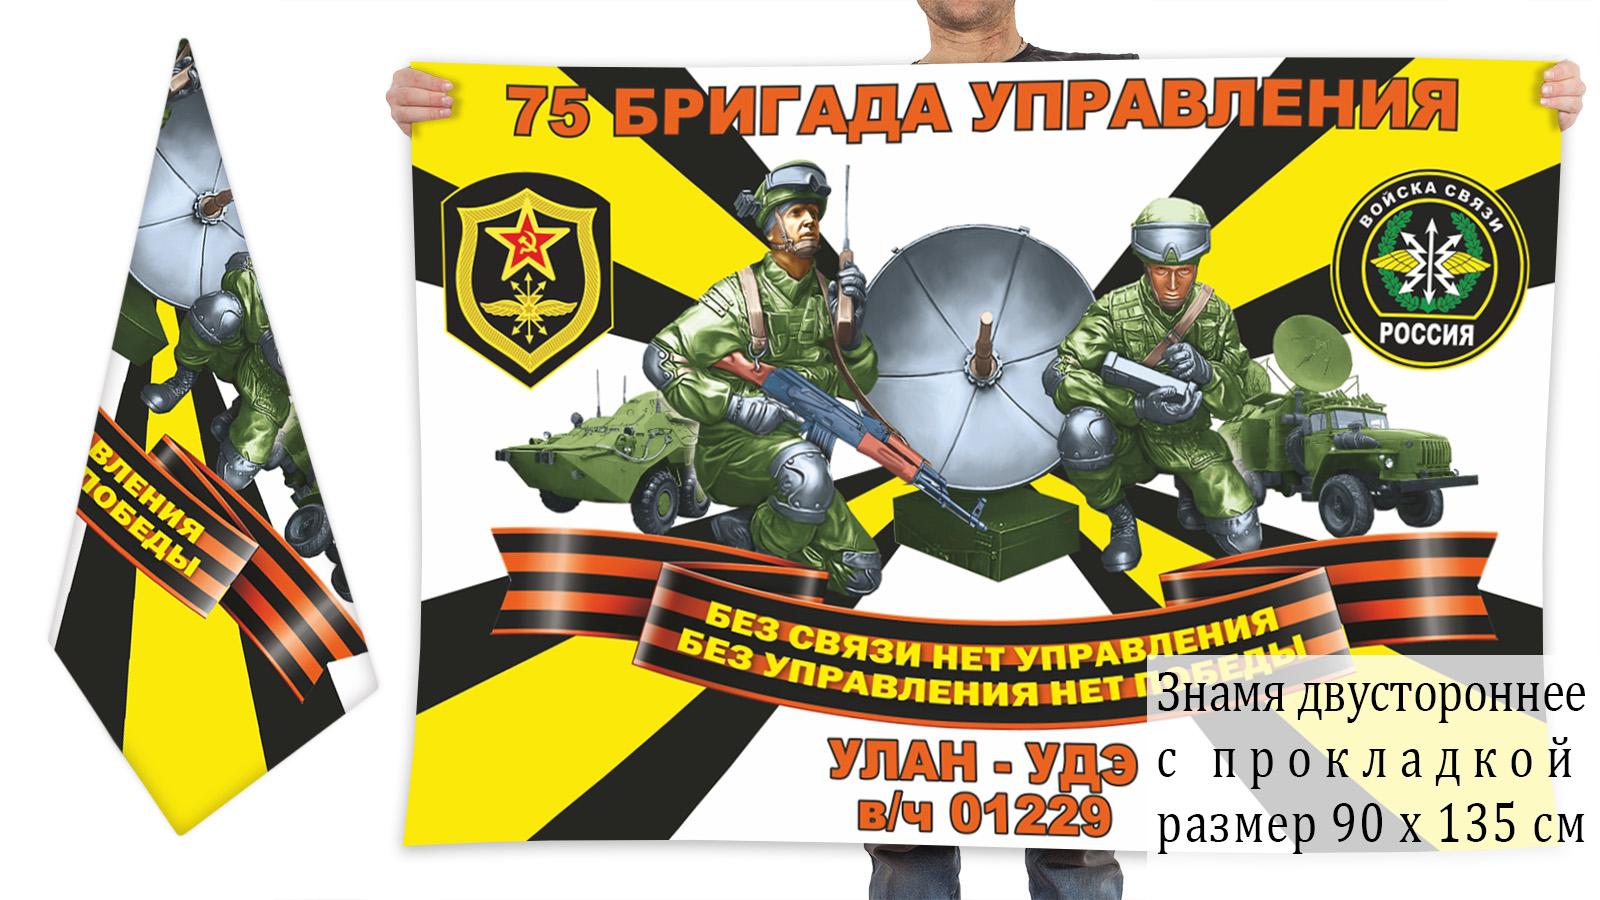 Двусторонний флаг 75 бригада управления войск связи